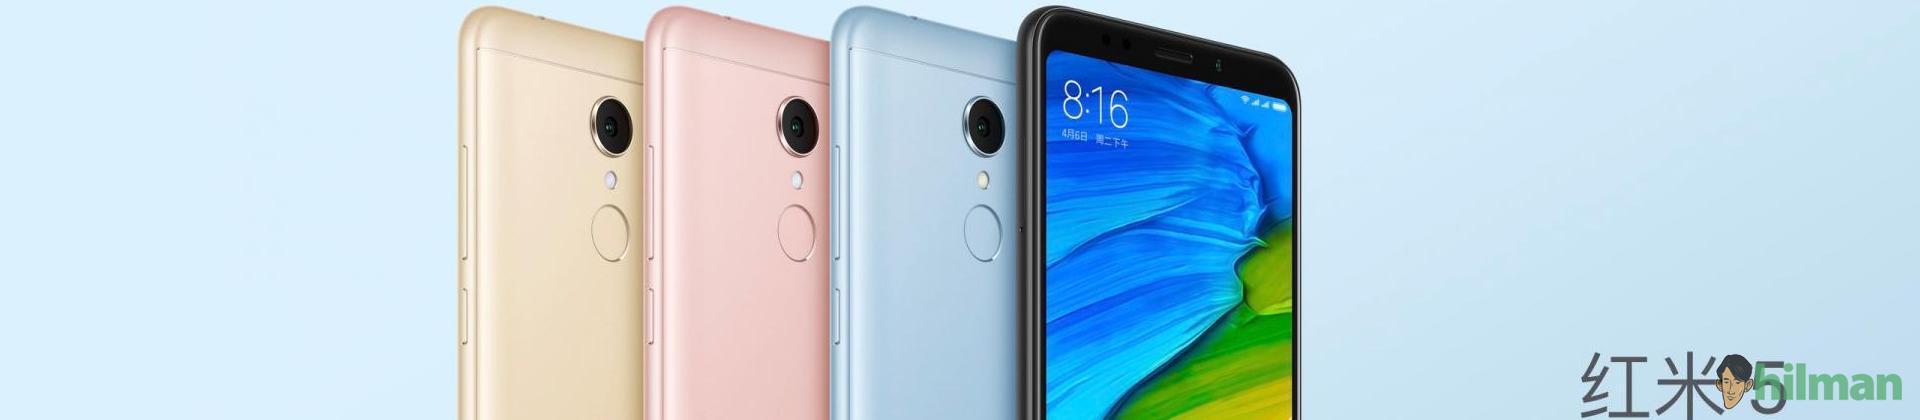 Xiaomi Rilis Redmi 5 dan 5 Plus,...